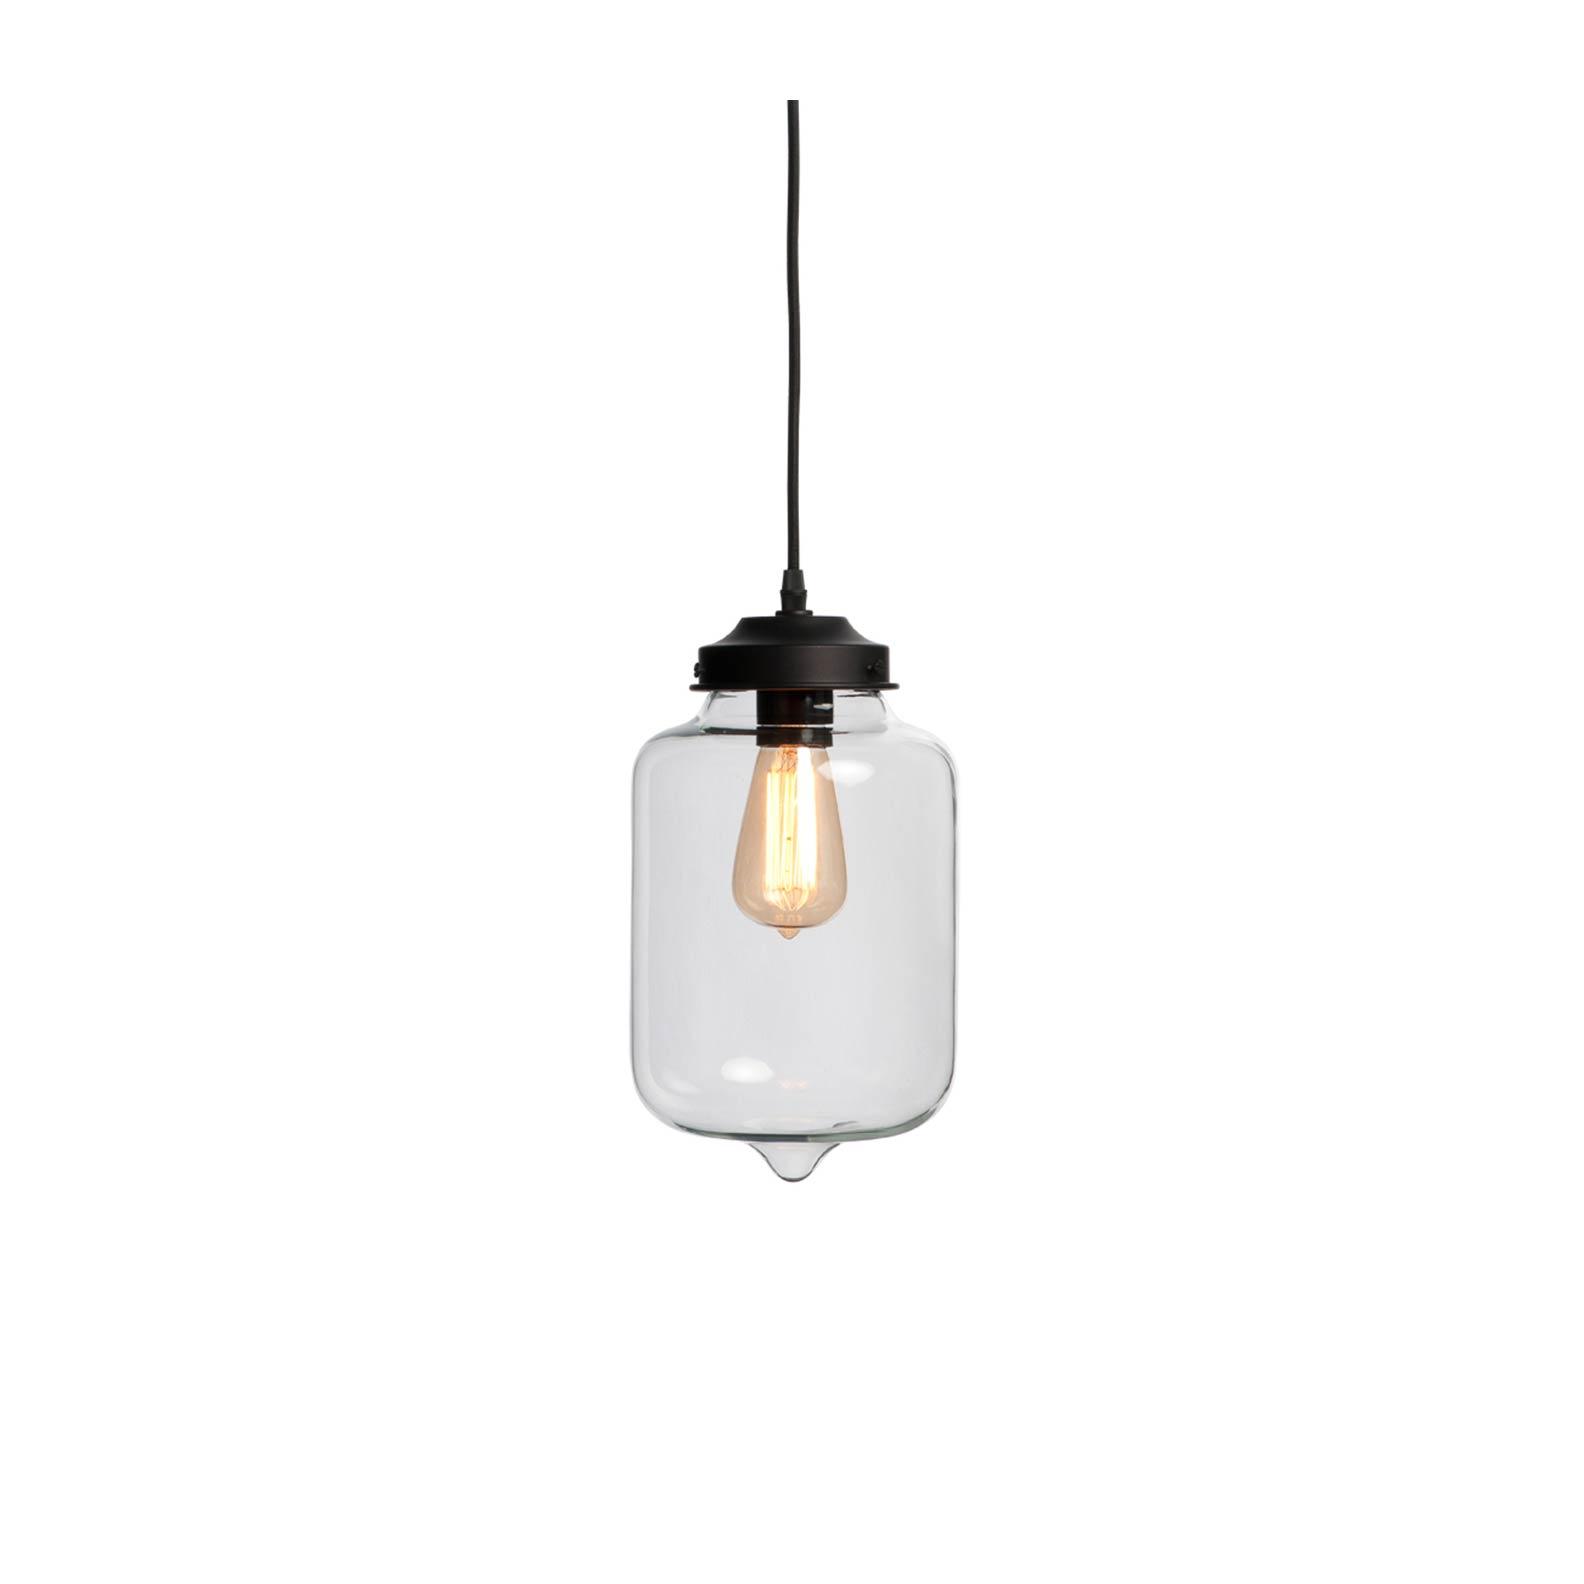 Decorative Lighting Online Shop In Dubai Unique Floor Lamps Hanging Table Lamps